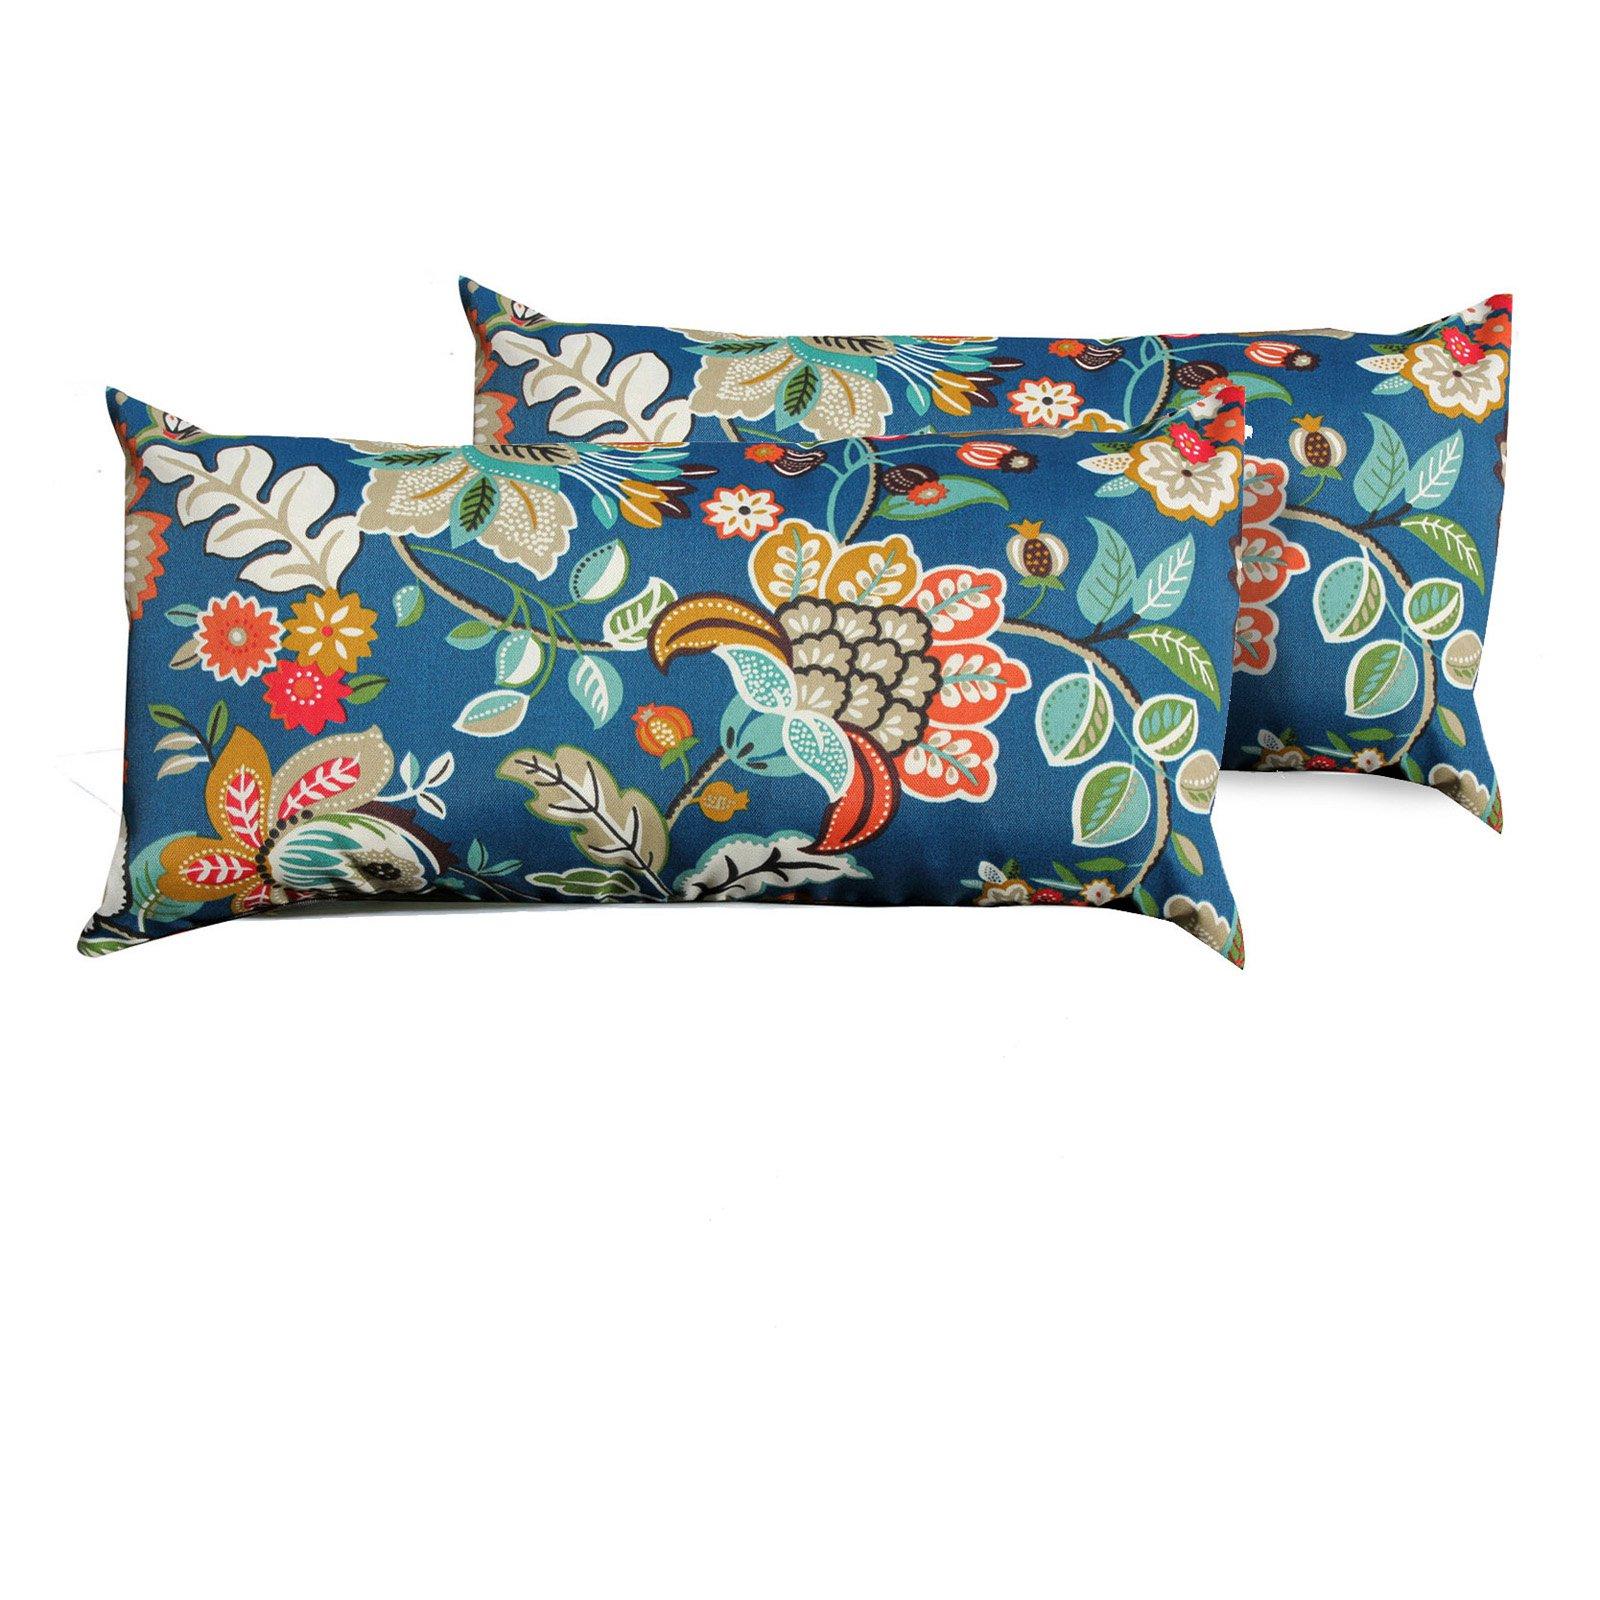 Tk Classics Wild Flower Outdoor Throw Pillows Set Of 2 Outdoor